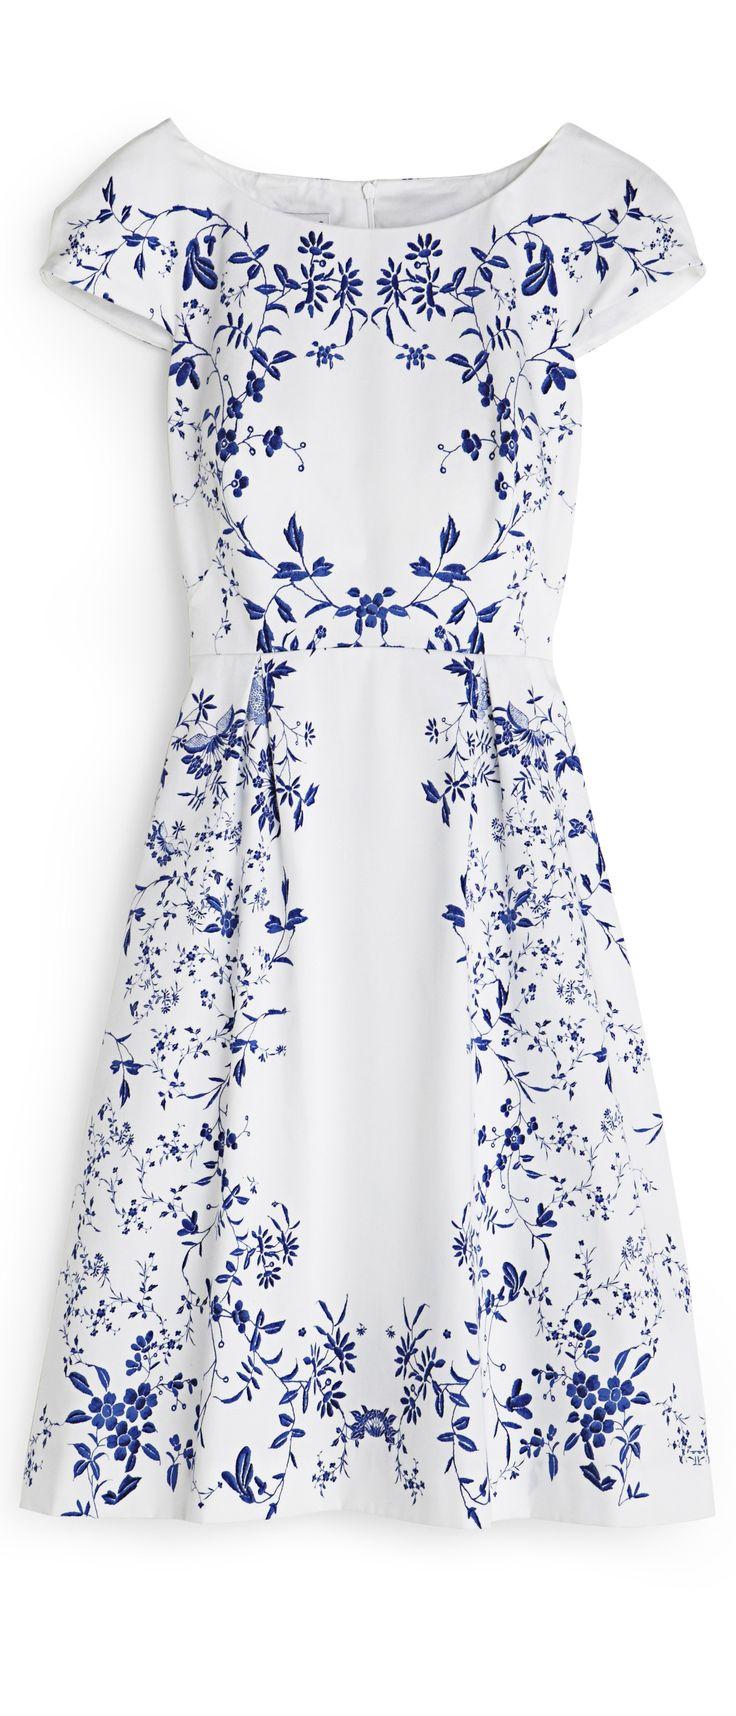 Delicate summer dress -- white with dark blue pattern